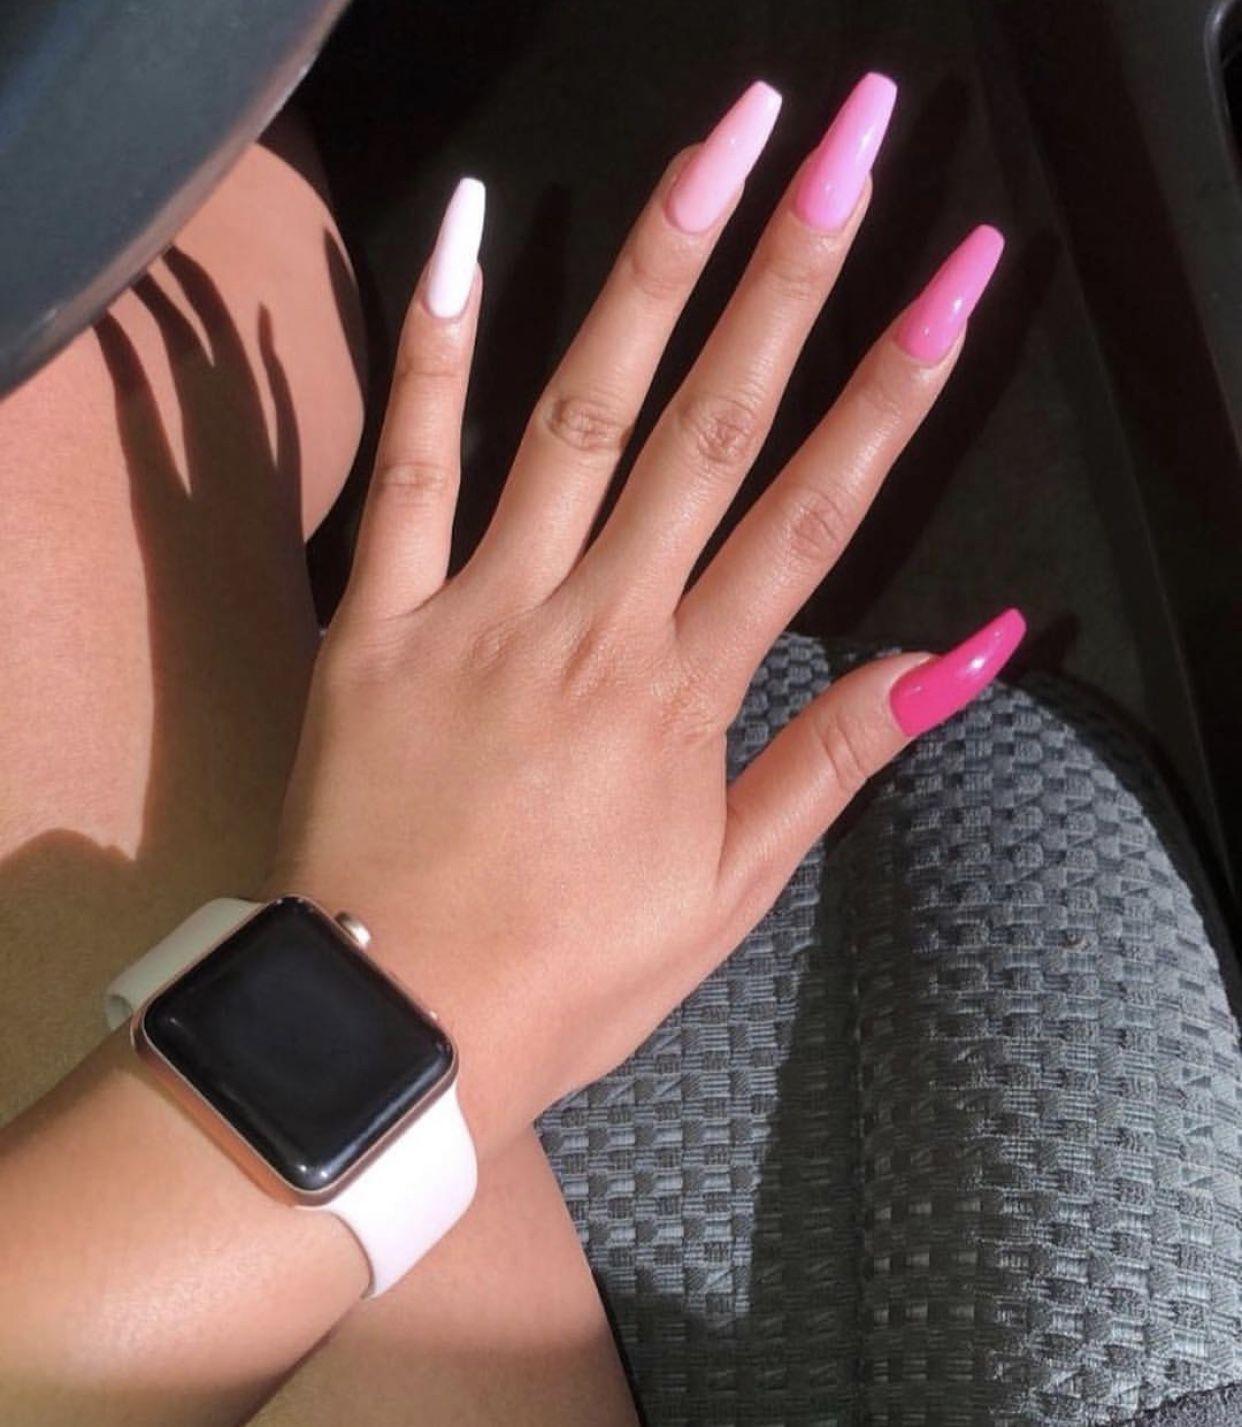 Pin By Gaby Grecula On Nails Pink Acrylic Nails Pink Acrylic Nail Designs Pink Nails